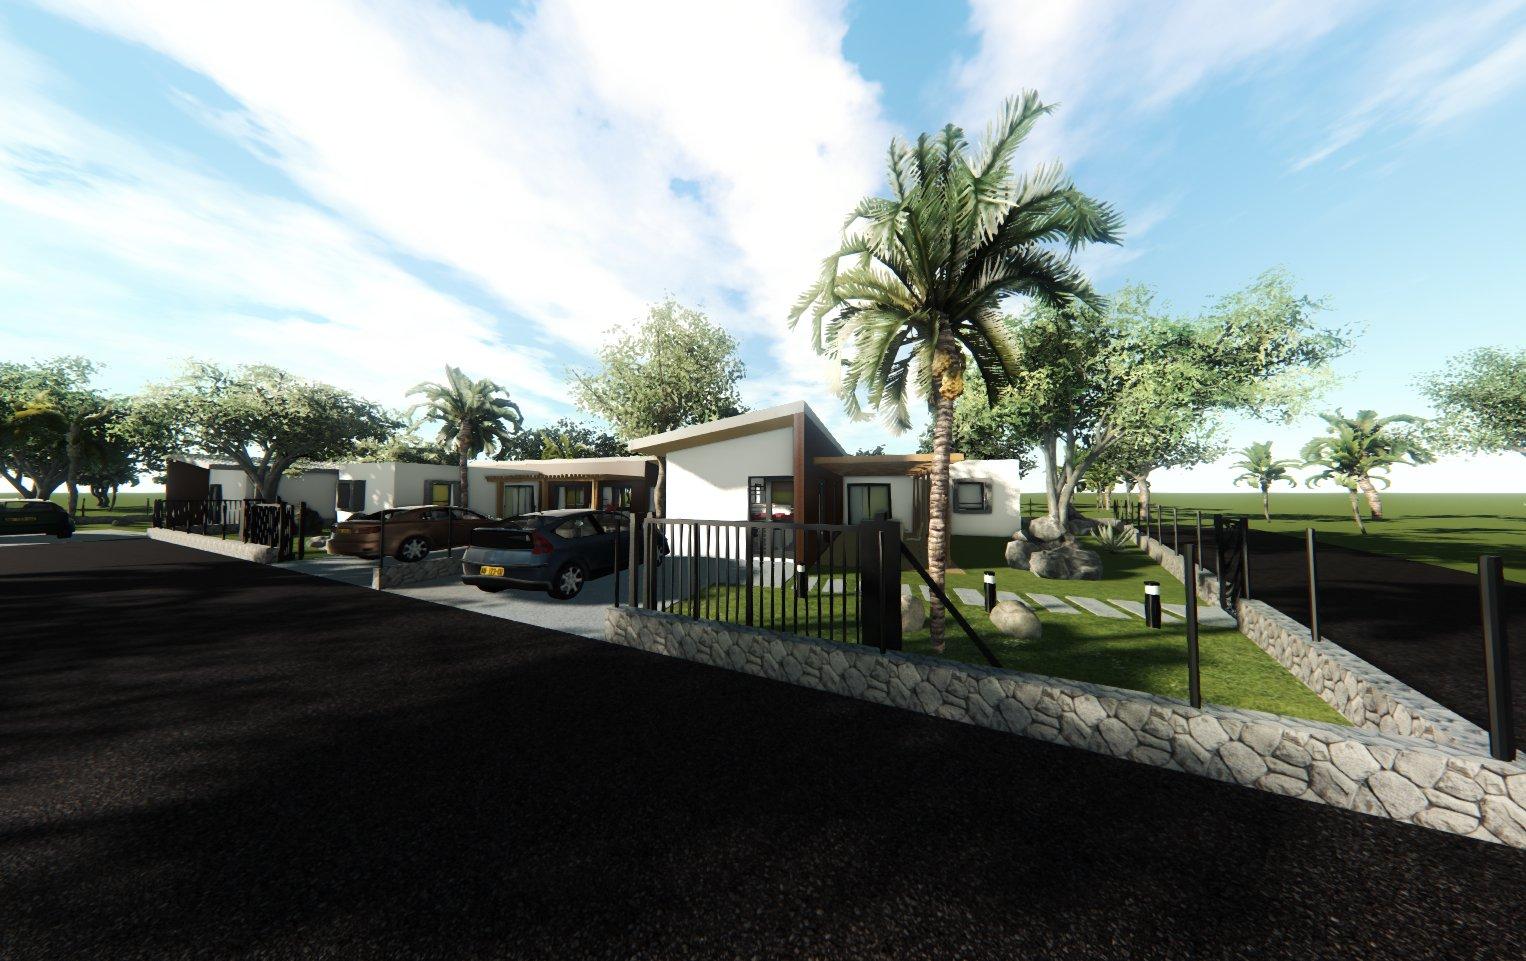 Achat villa saint beno t 97437 r union est r f 3885 for Achat villa neuve